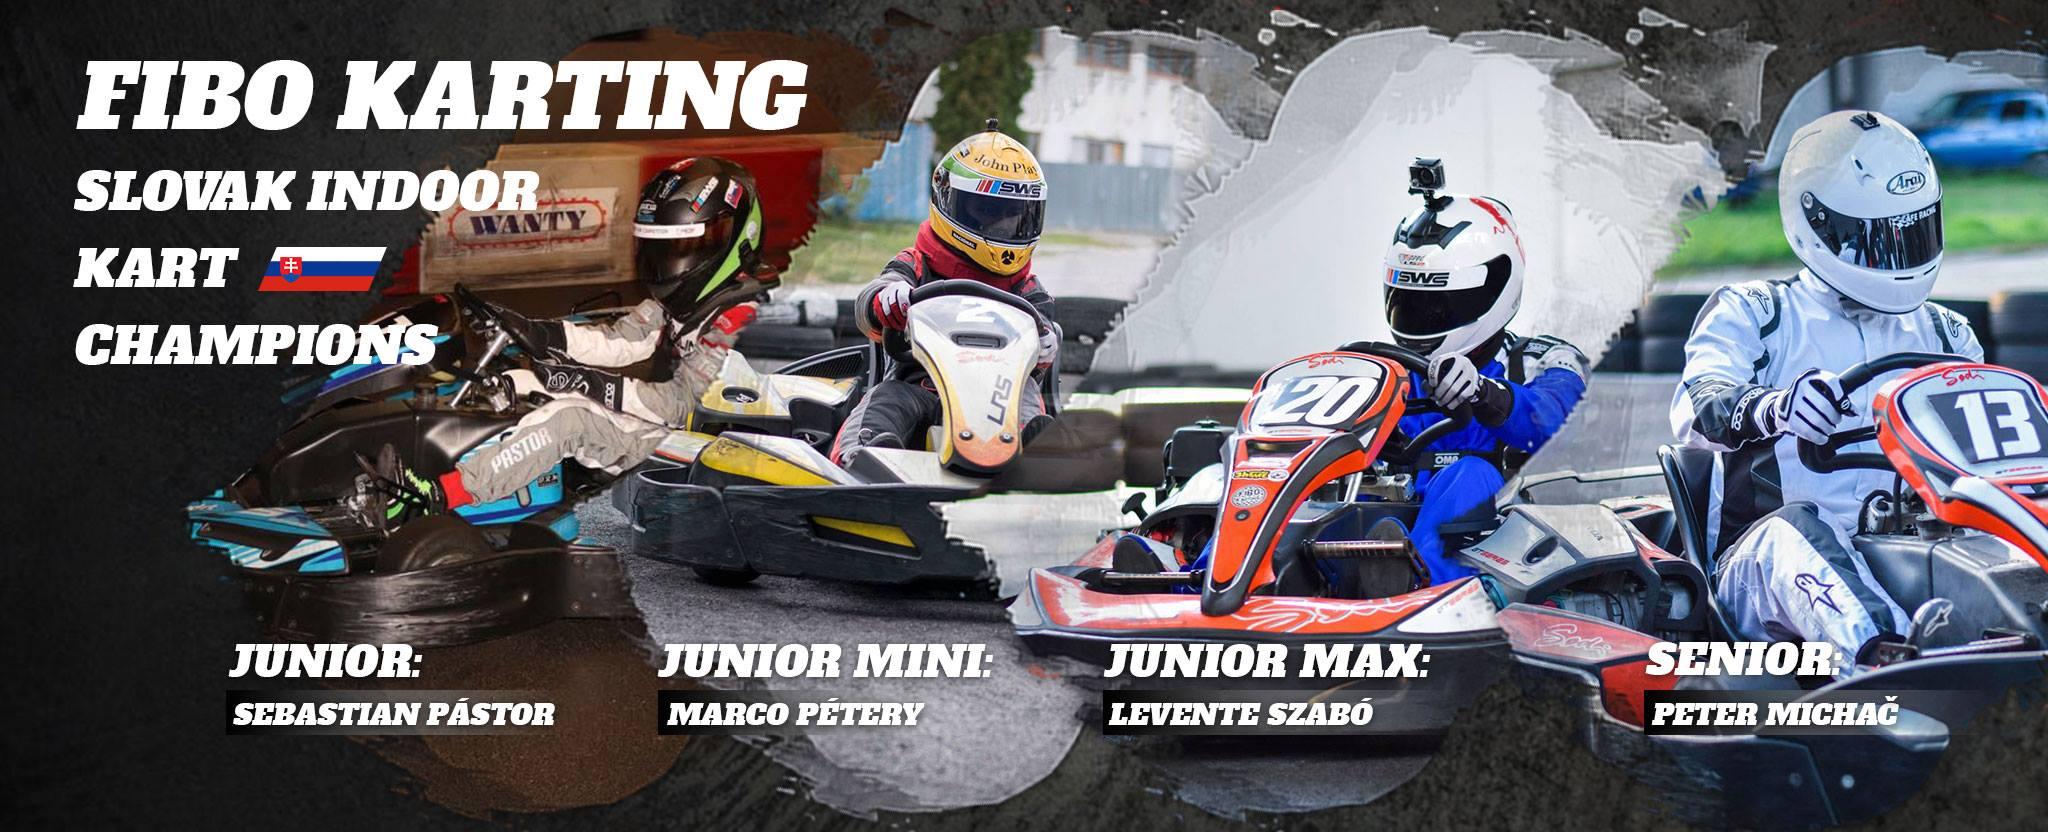 FIBO_Karting_Indoor_Karting_Champions_2018